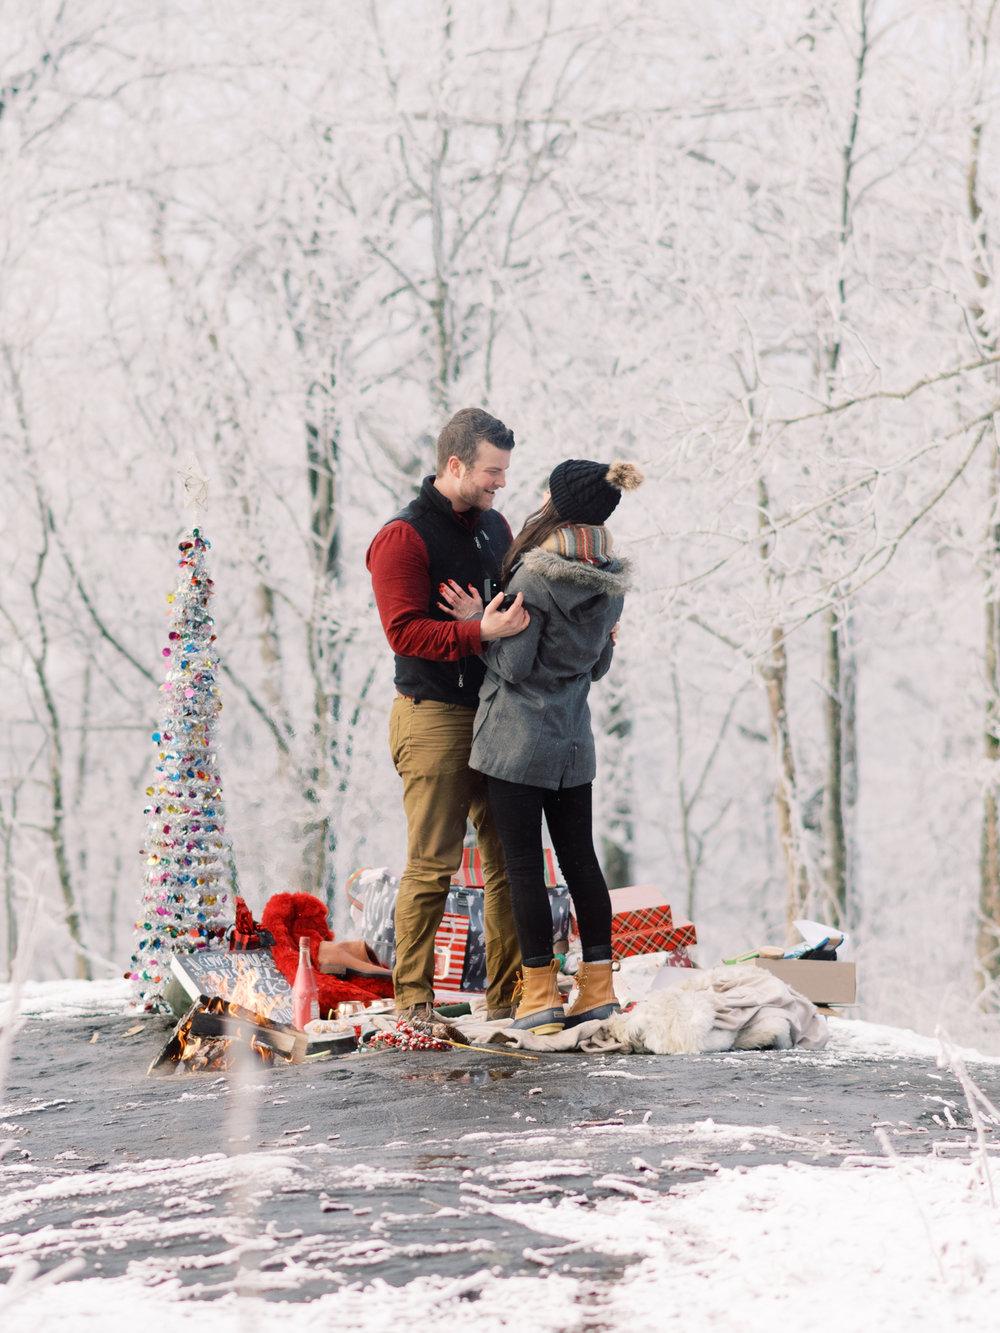 snowy-georgia-proposal-preachers-rock-atlanta-dahlonega-wedding-photographer-hannah-forsberg-fine-art-film-11.jpg